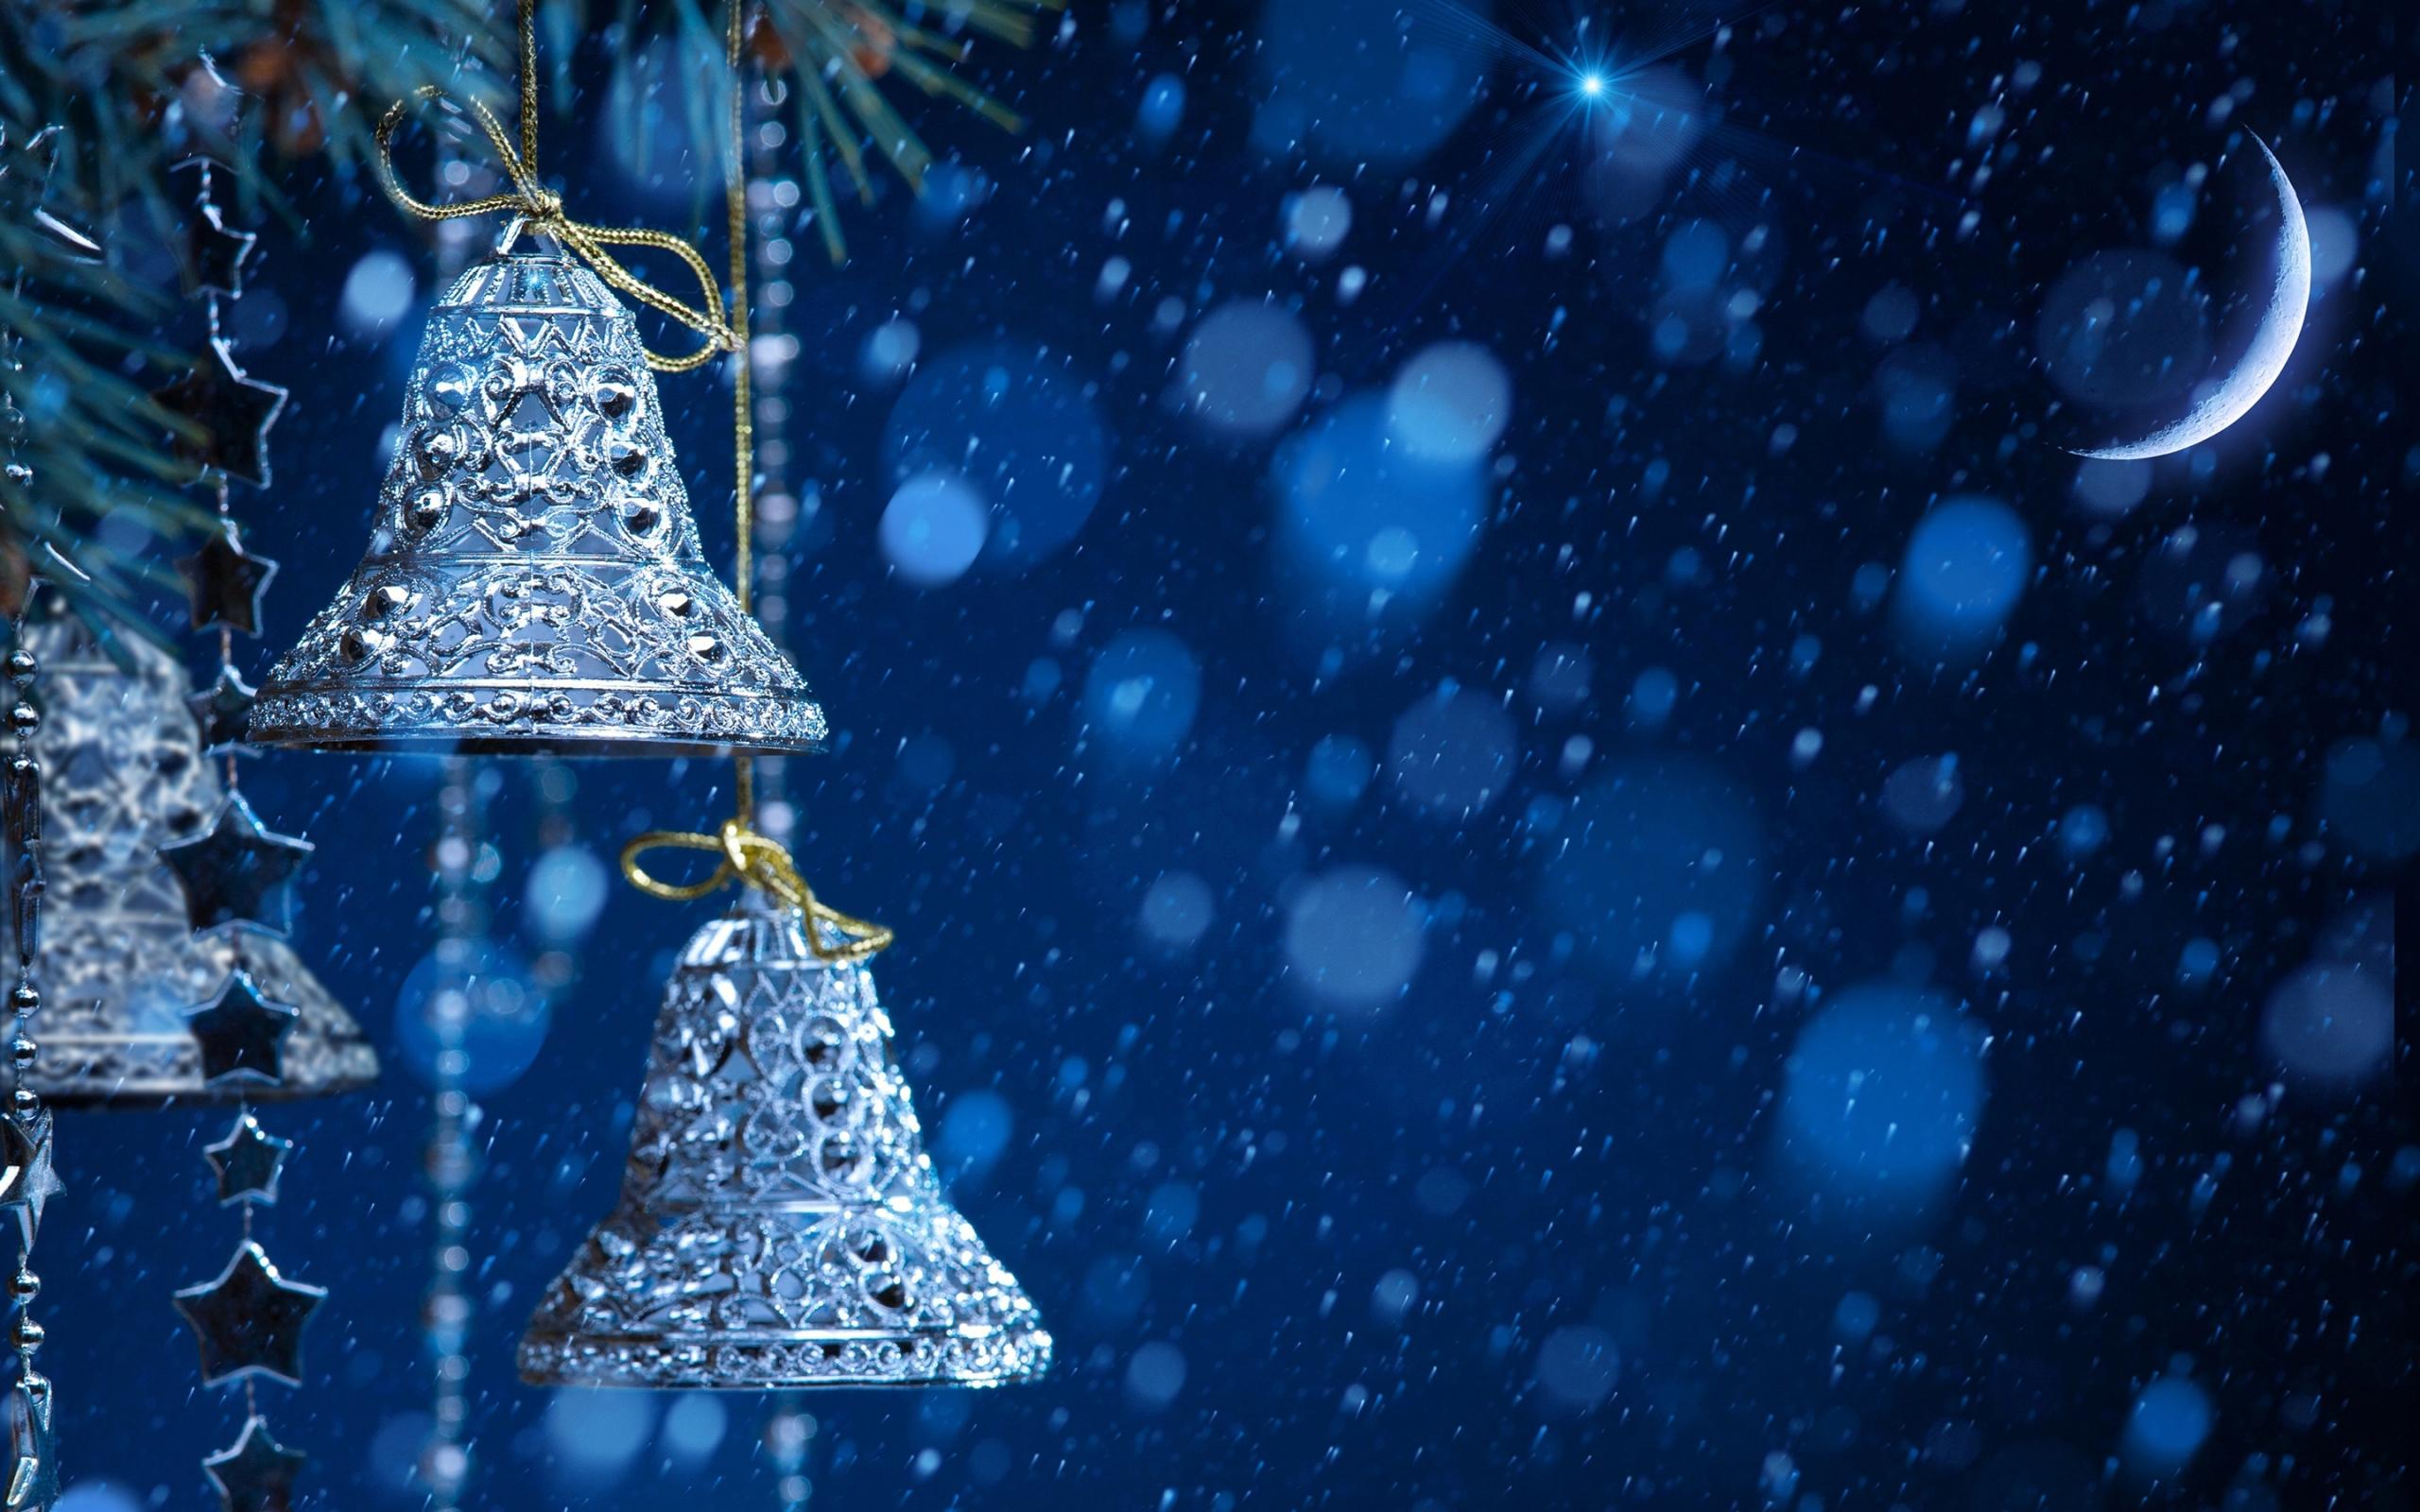 Blue Winter Night Bells And Moon Hd Wallpaper